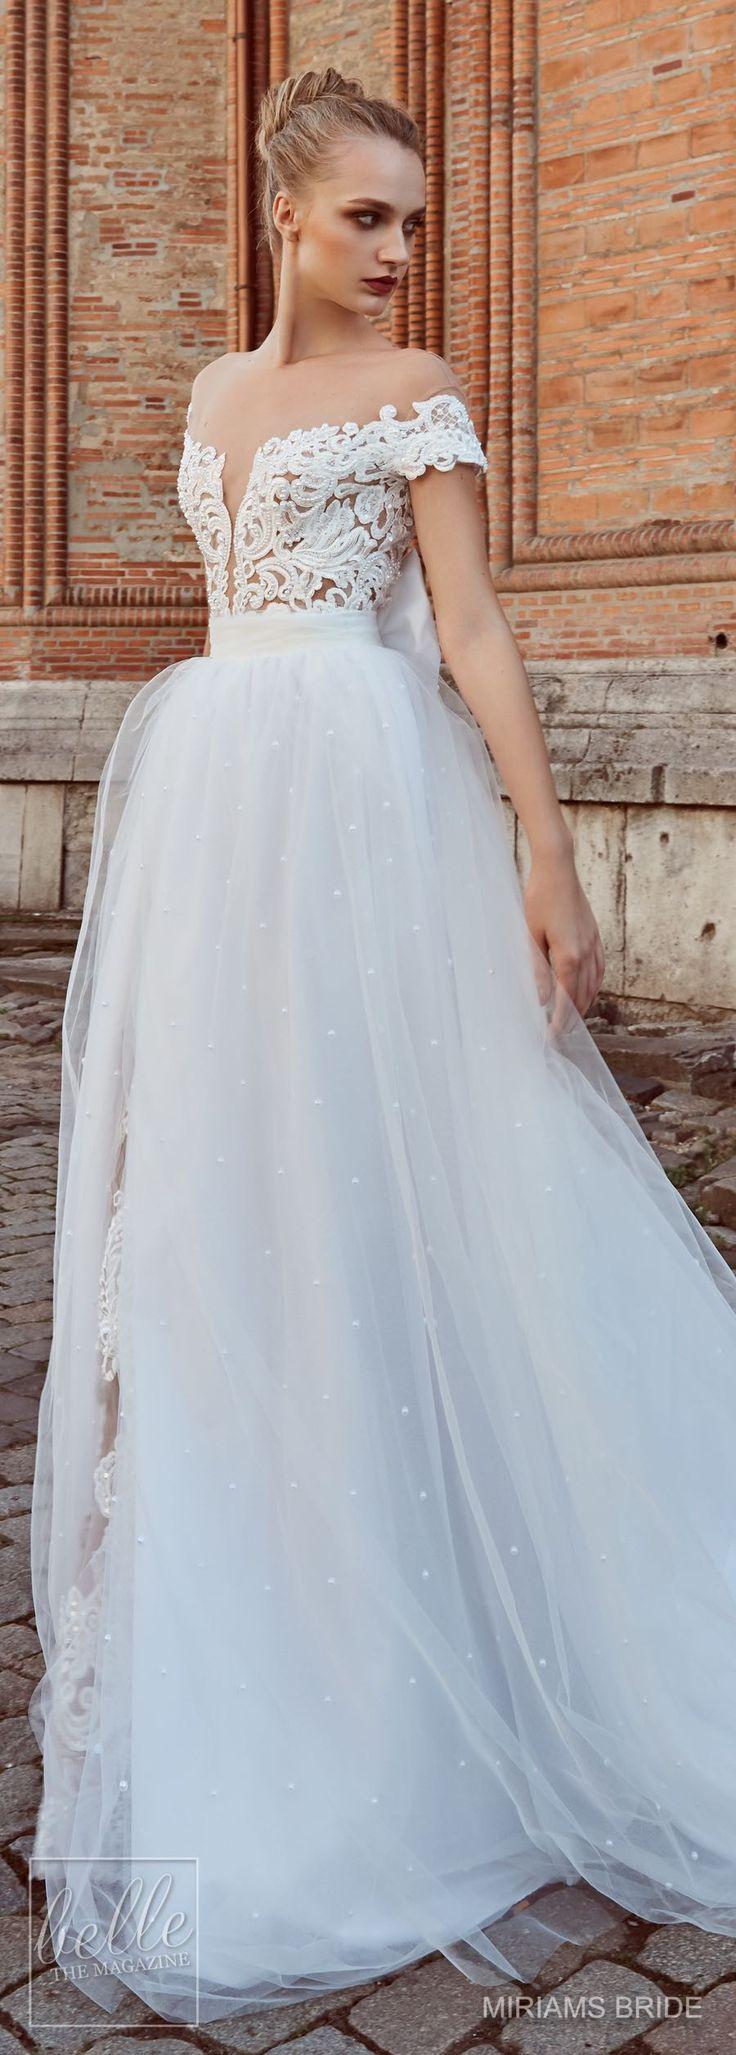 317 best Ball Gown, A-line, Princess Wedding Dresses images on Pinterest